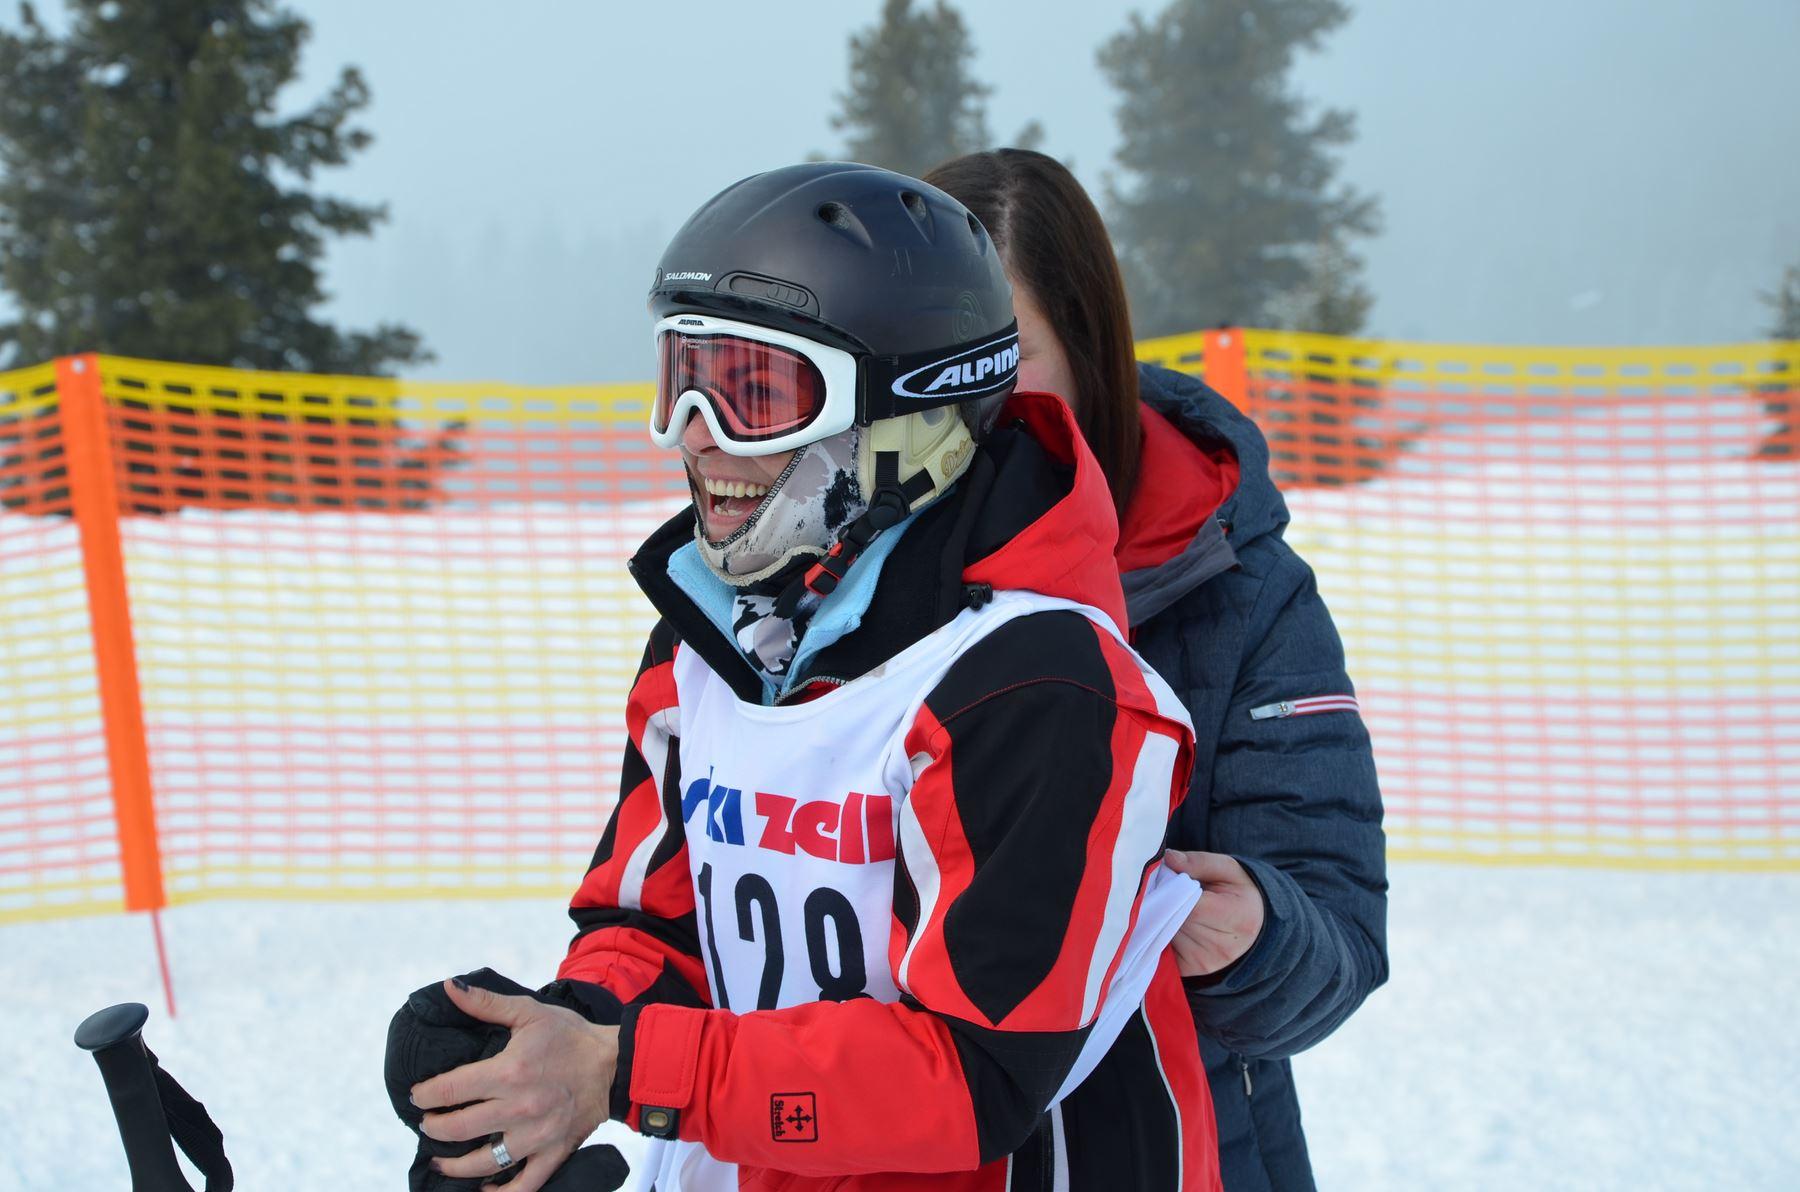 2015-03-22 BV Zillertal Skirennen 249.JPG